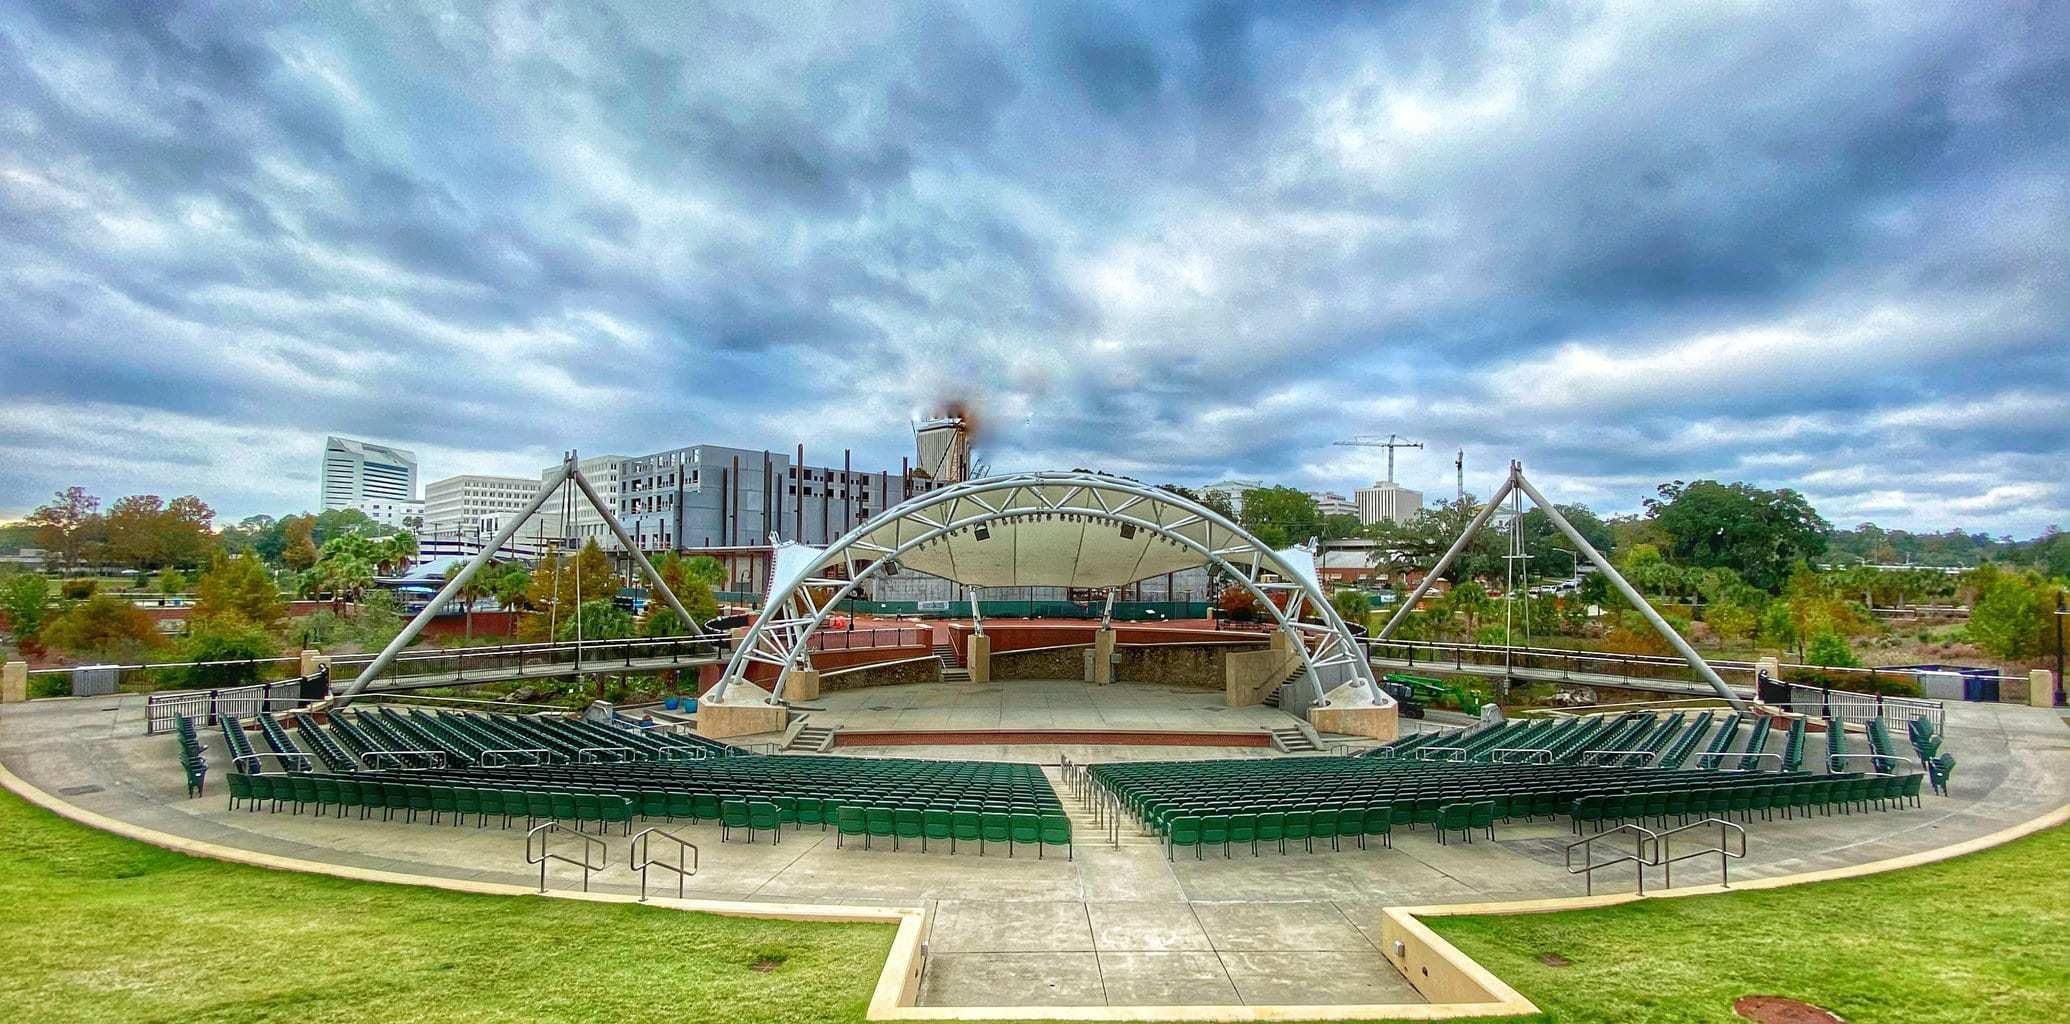 Capital City Amphitheater